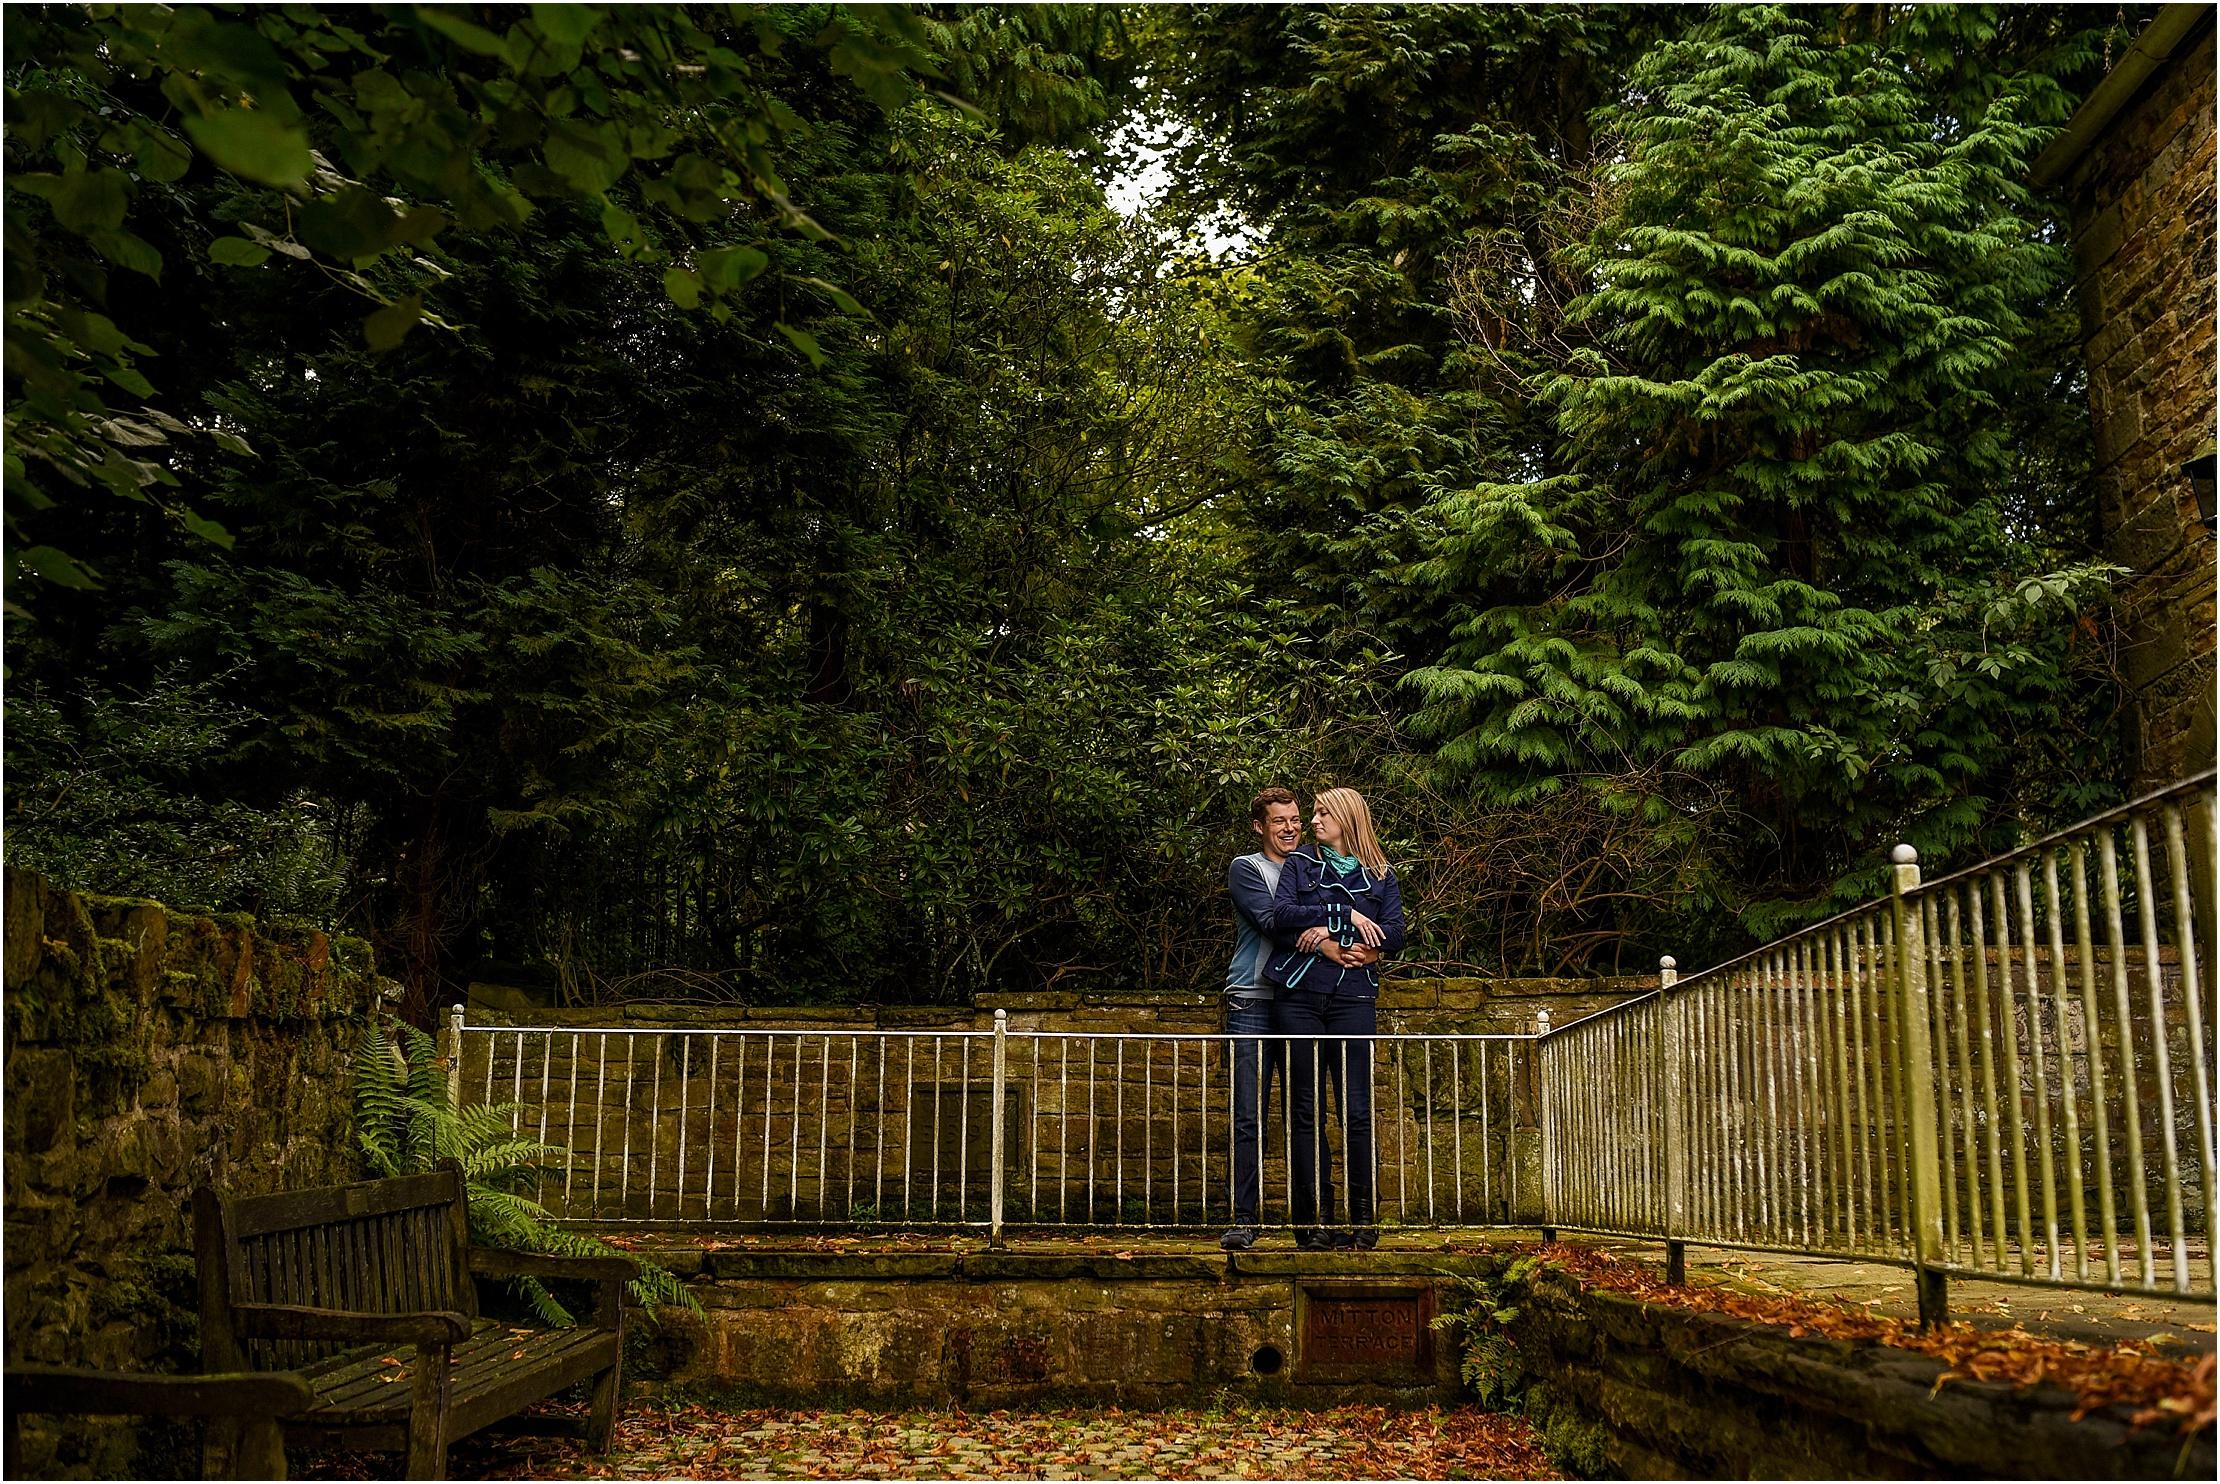 townley-park-pre-wedding-photography-19.jpg